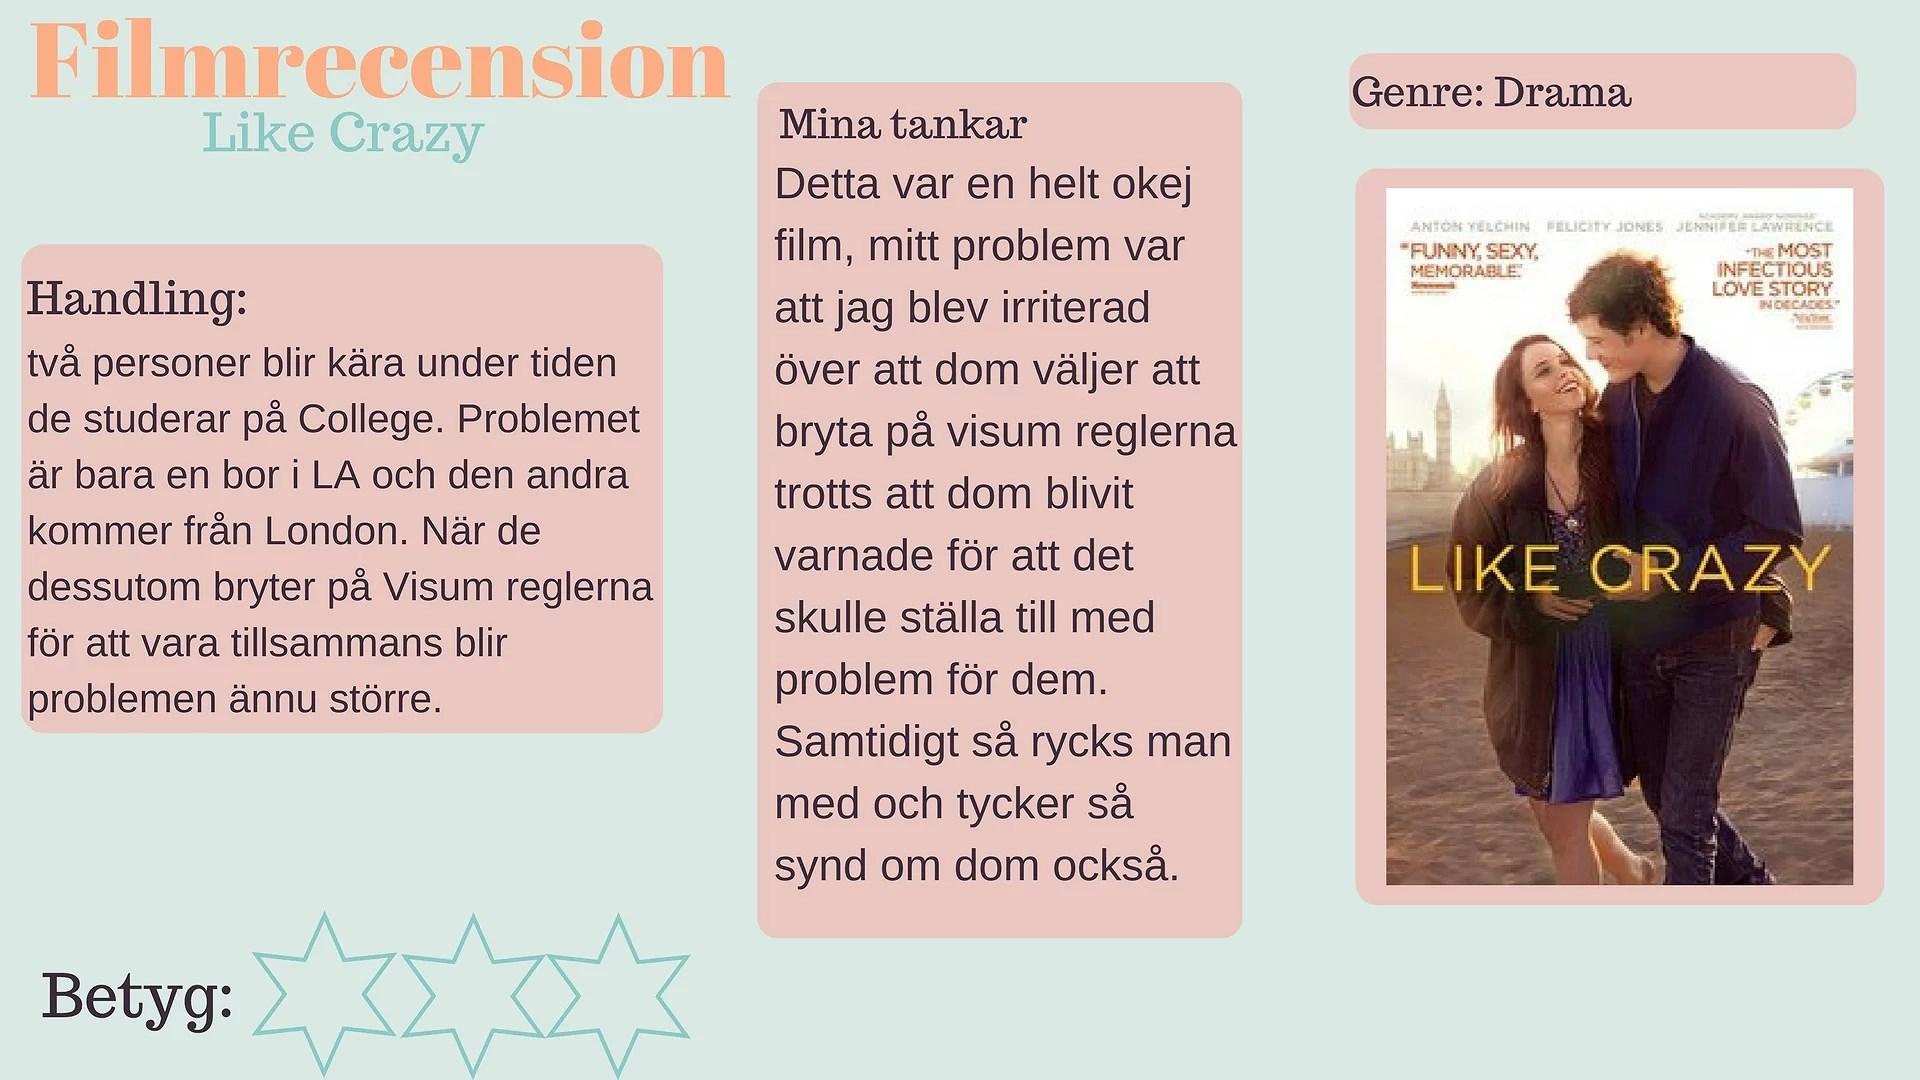 Filmrecenson - Like Crazy